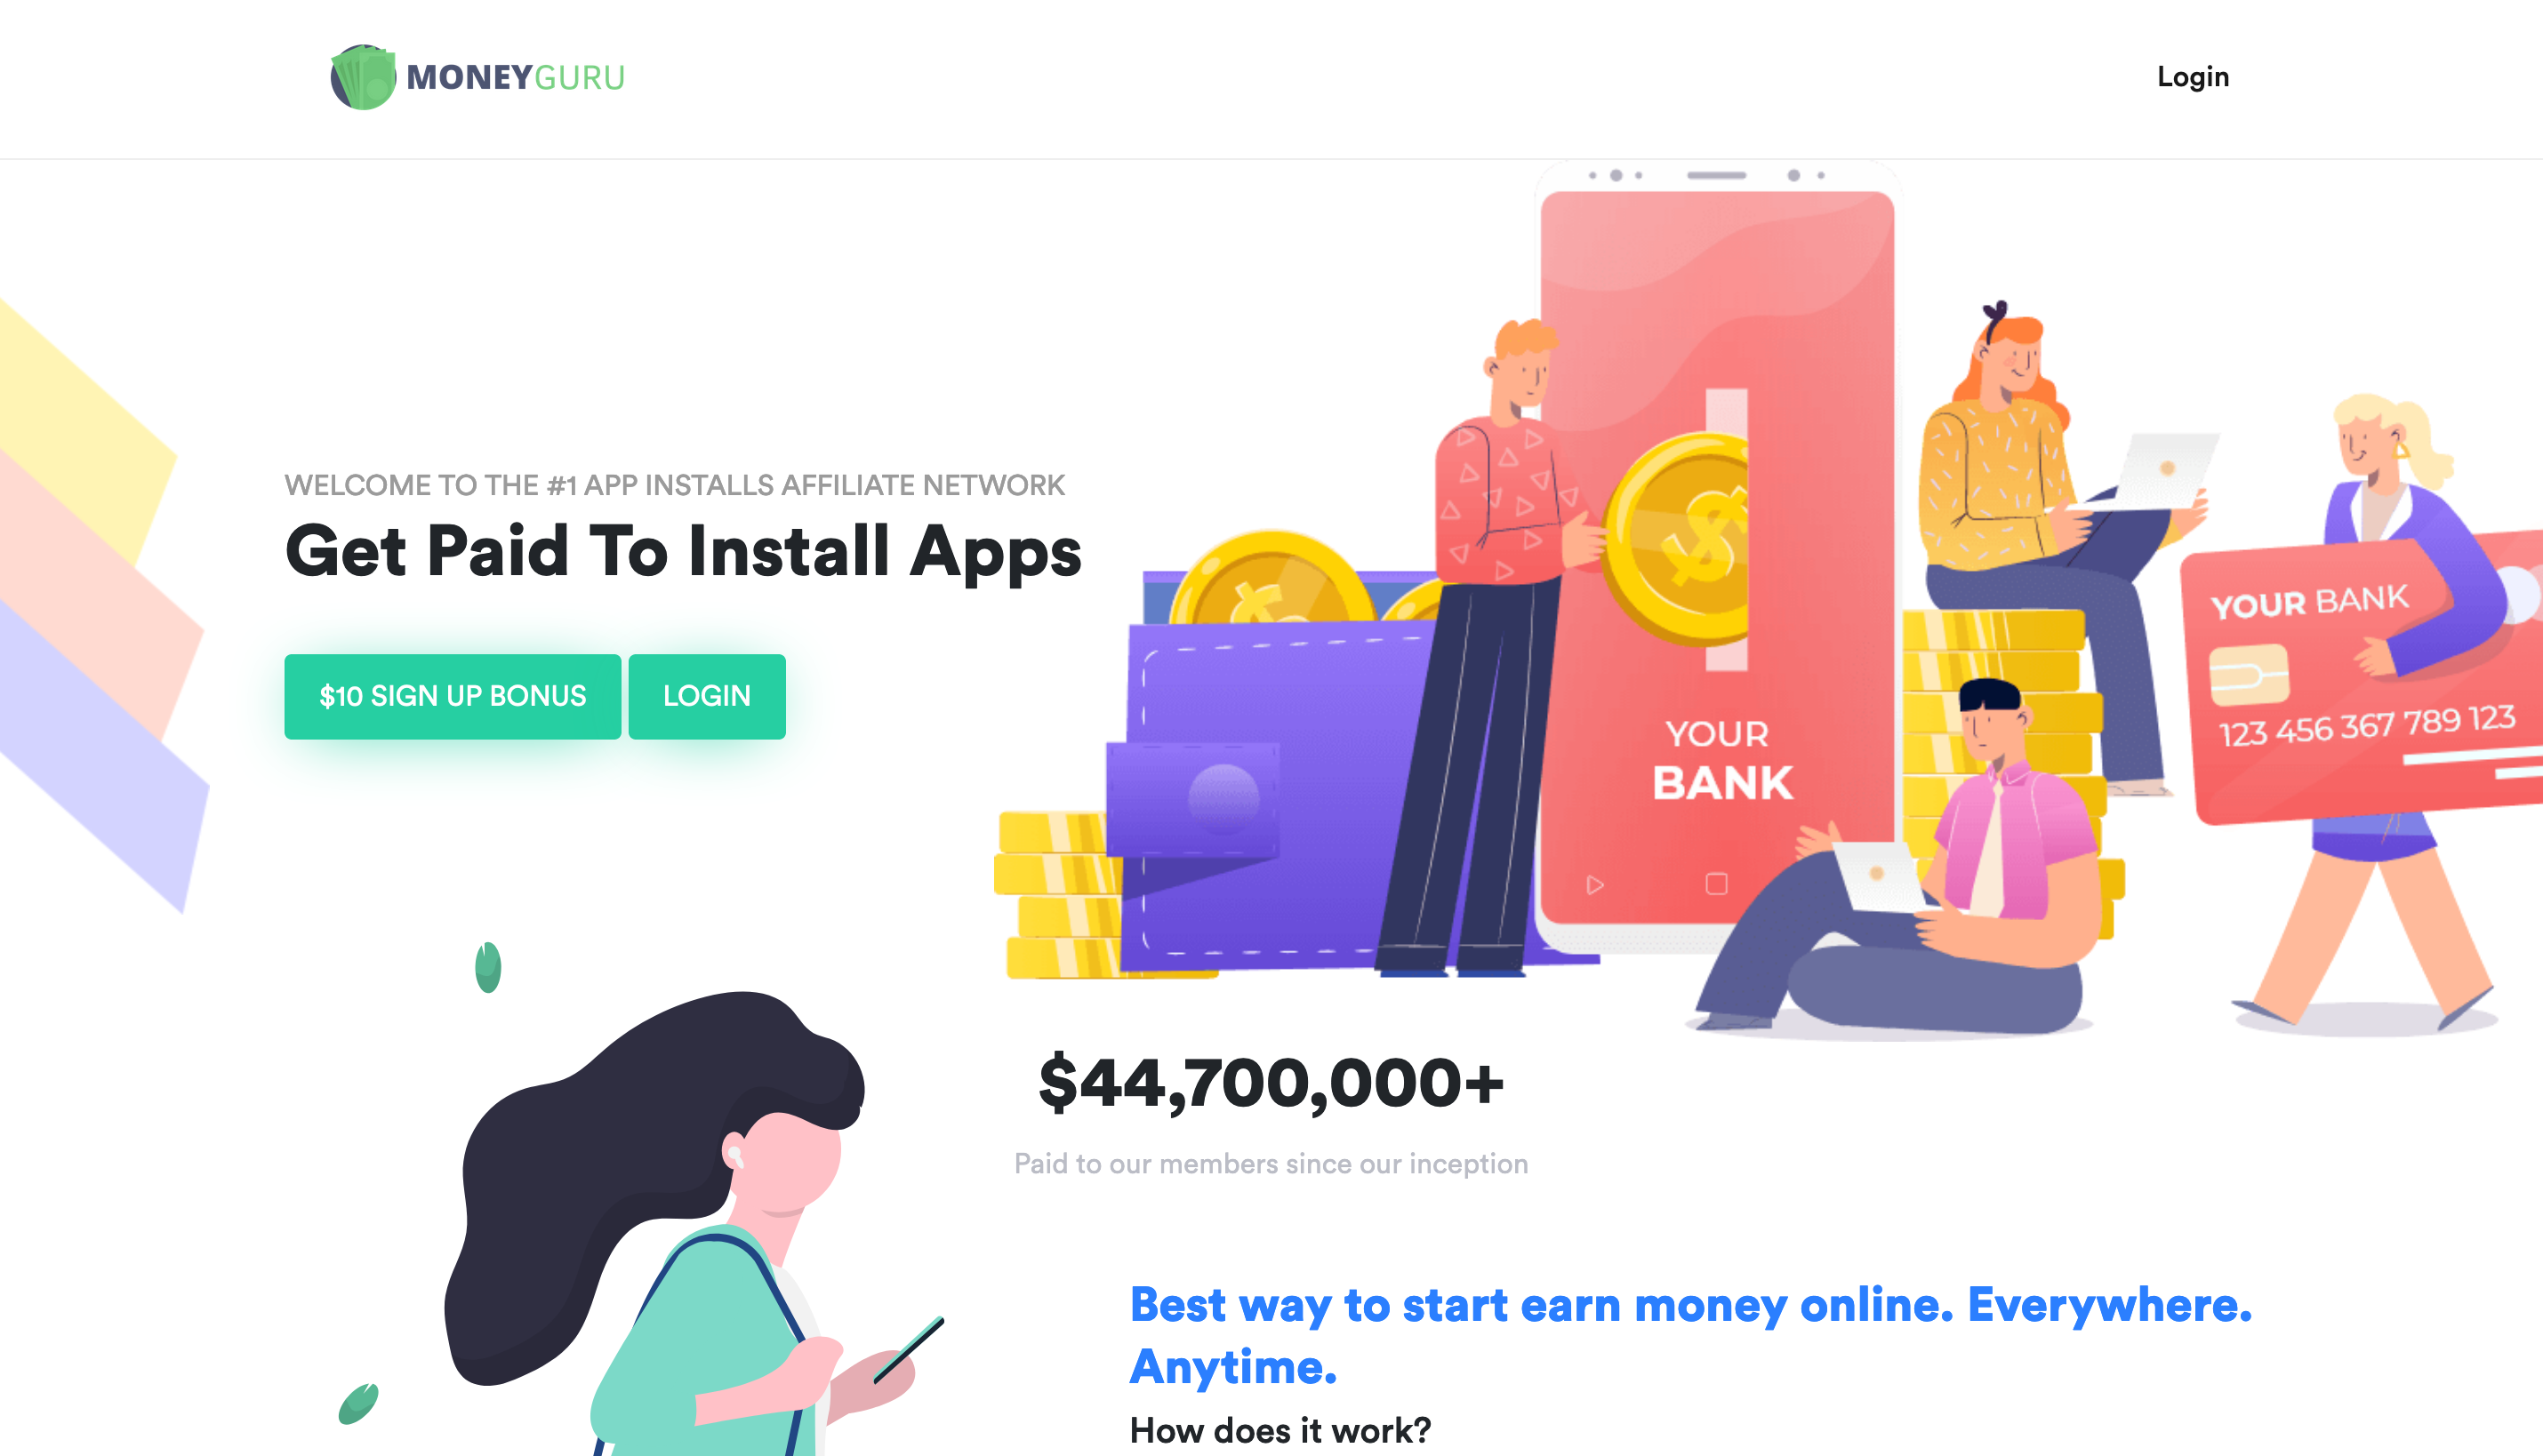 MoneyGuru - #1 INFLUENCER NETWORK